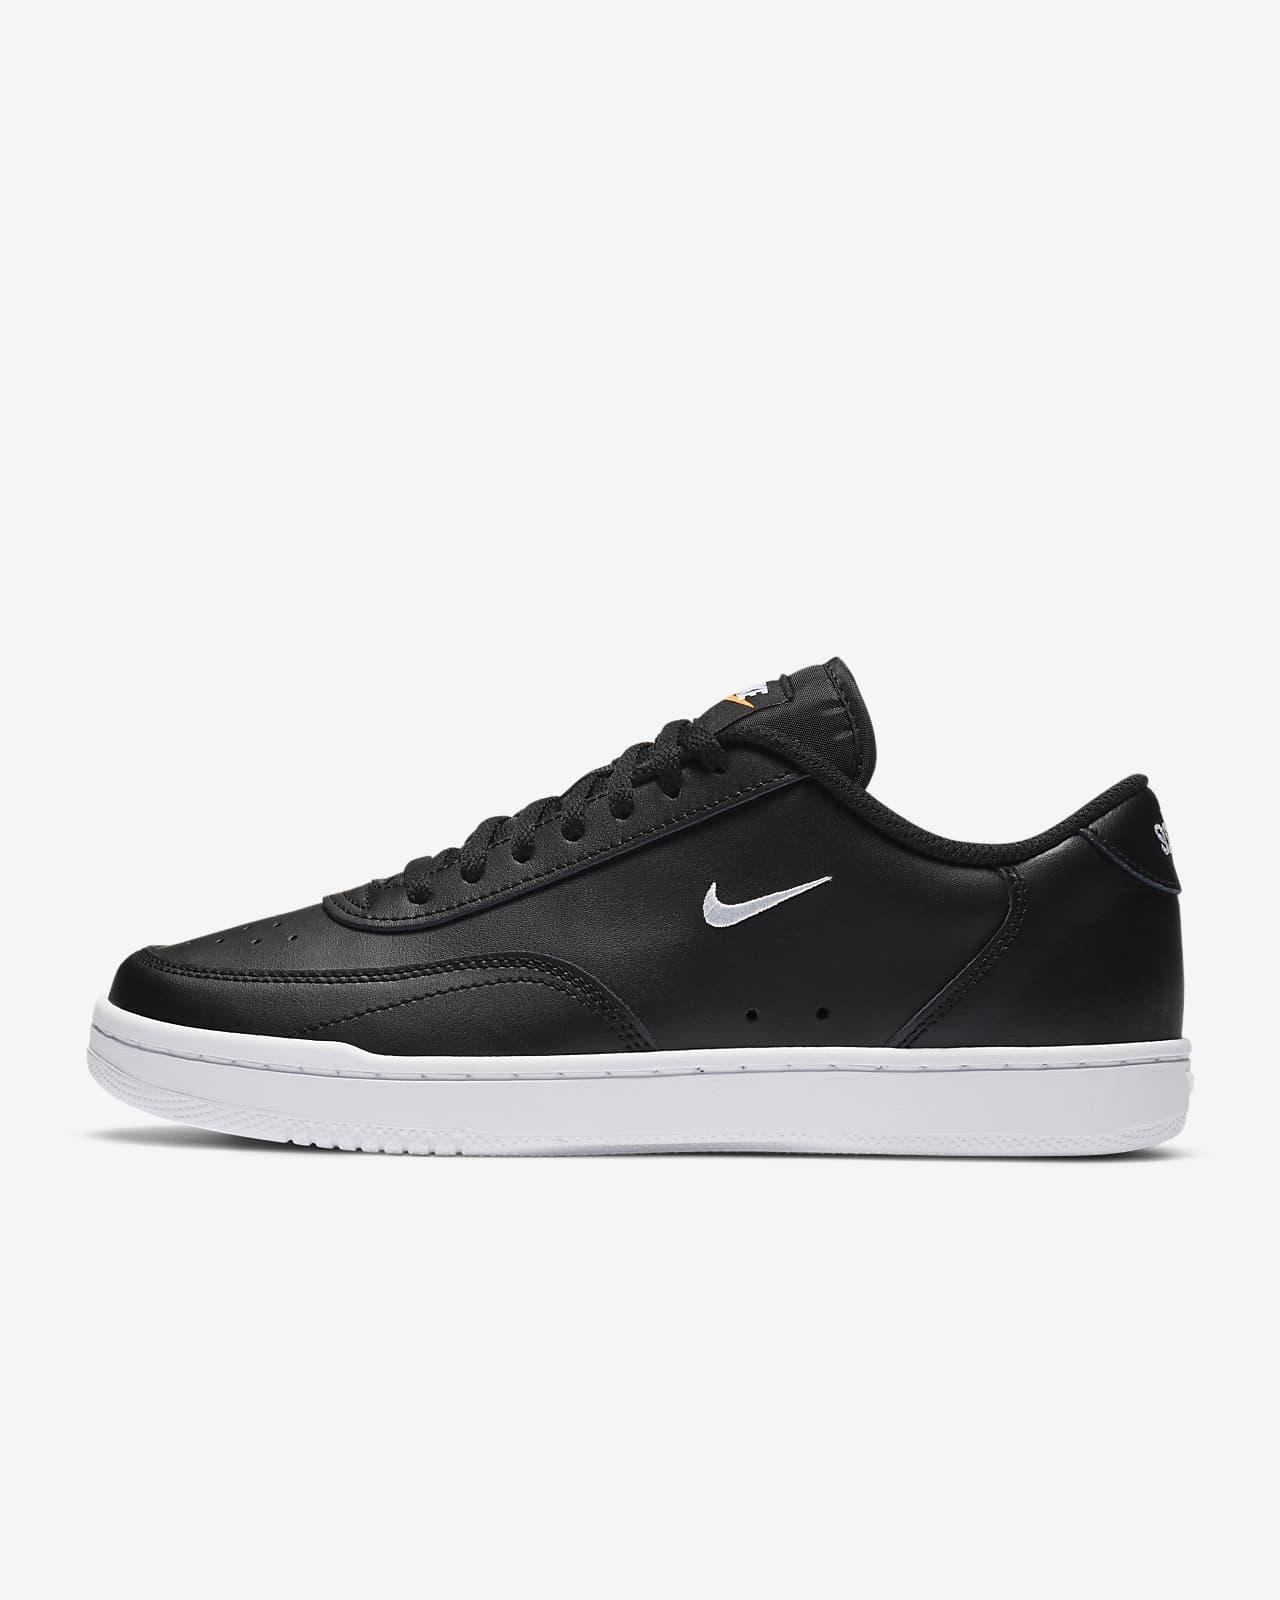 NikeCourt Vintage Women's Shoe